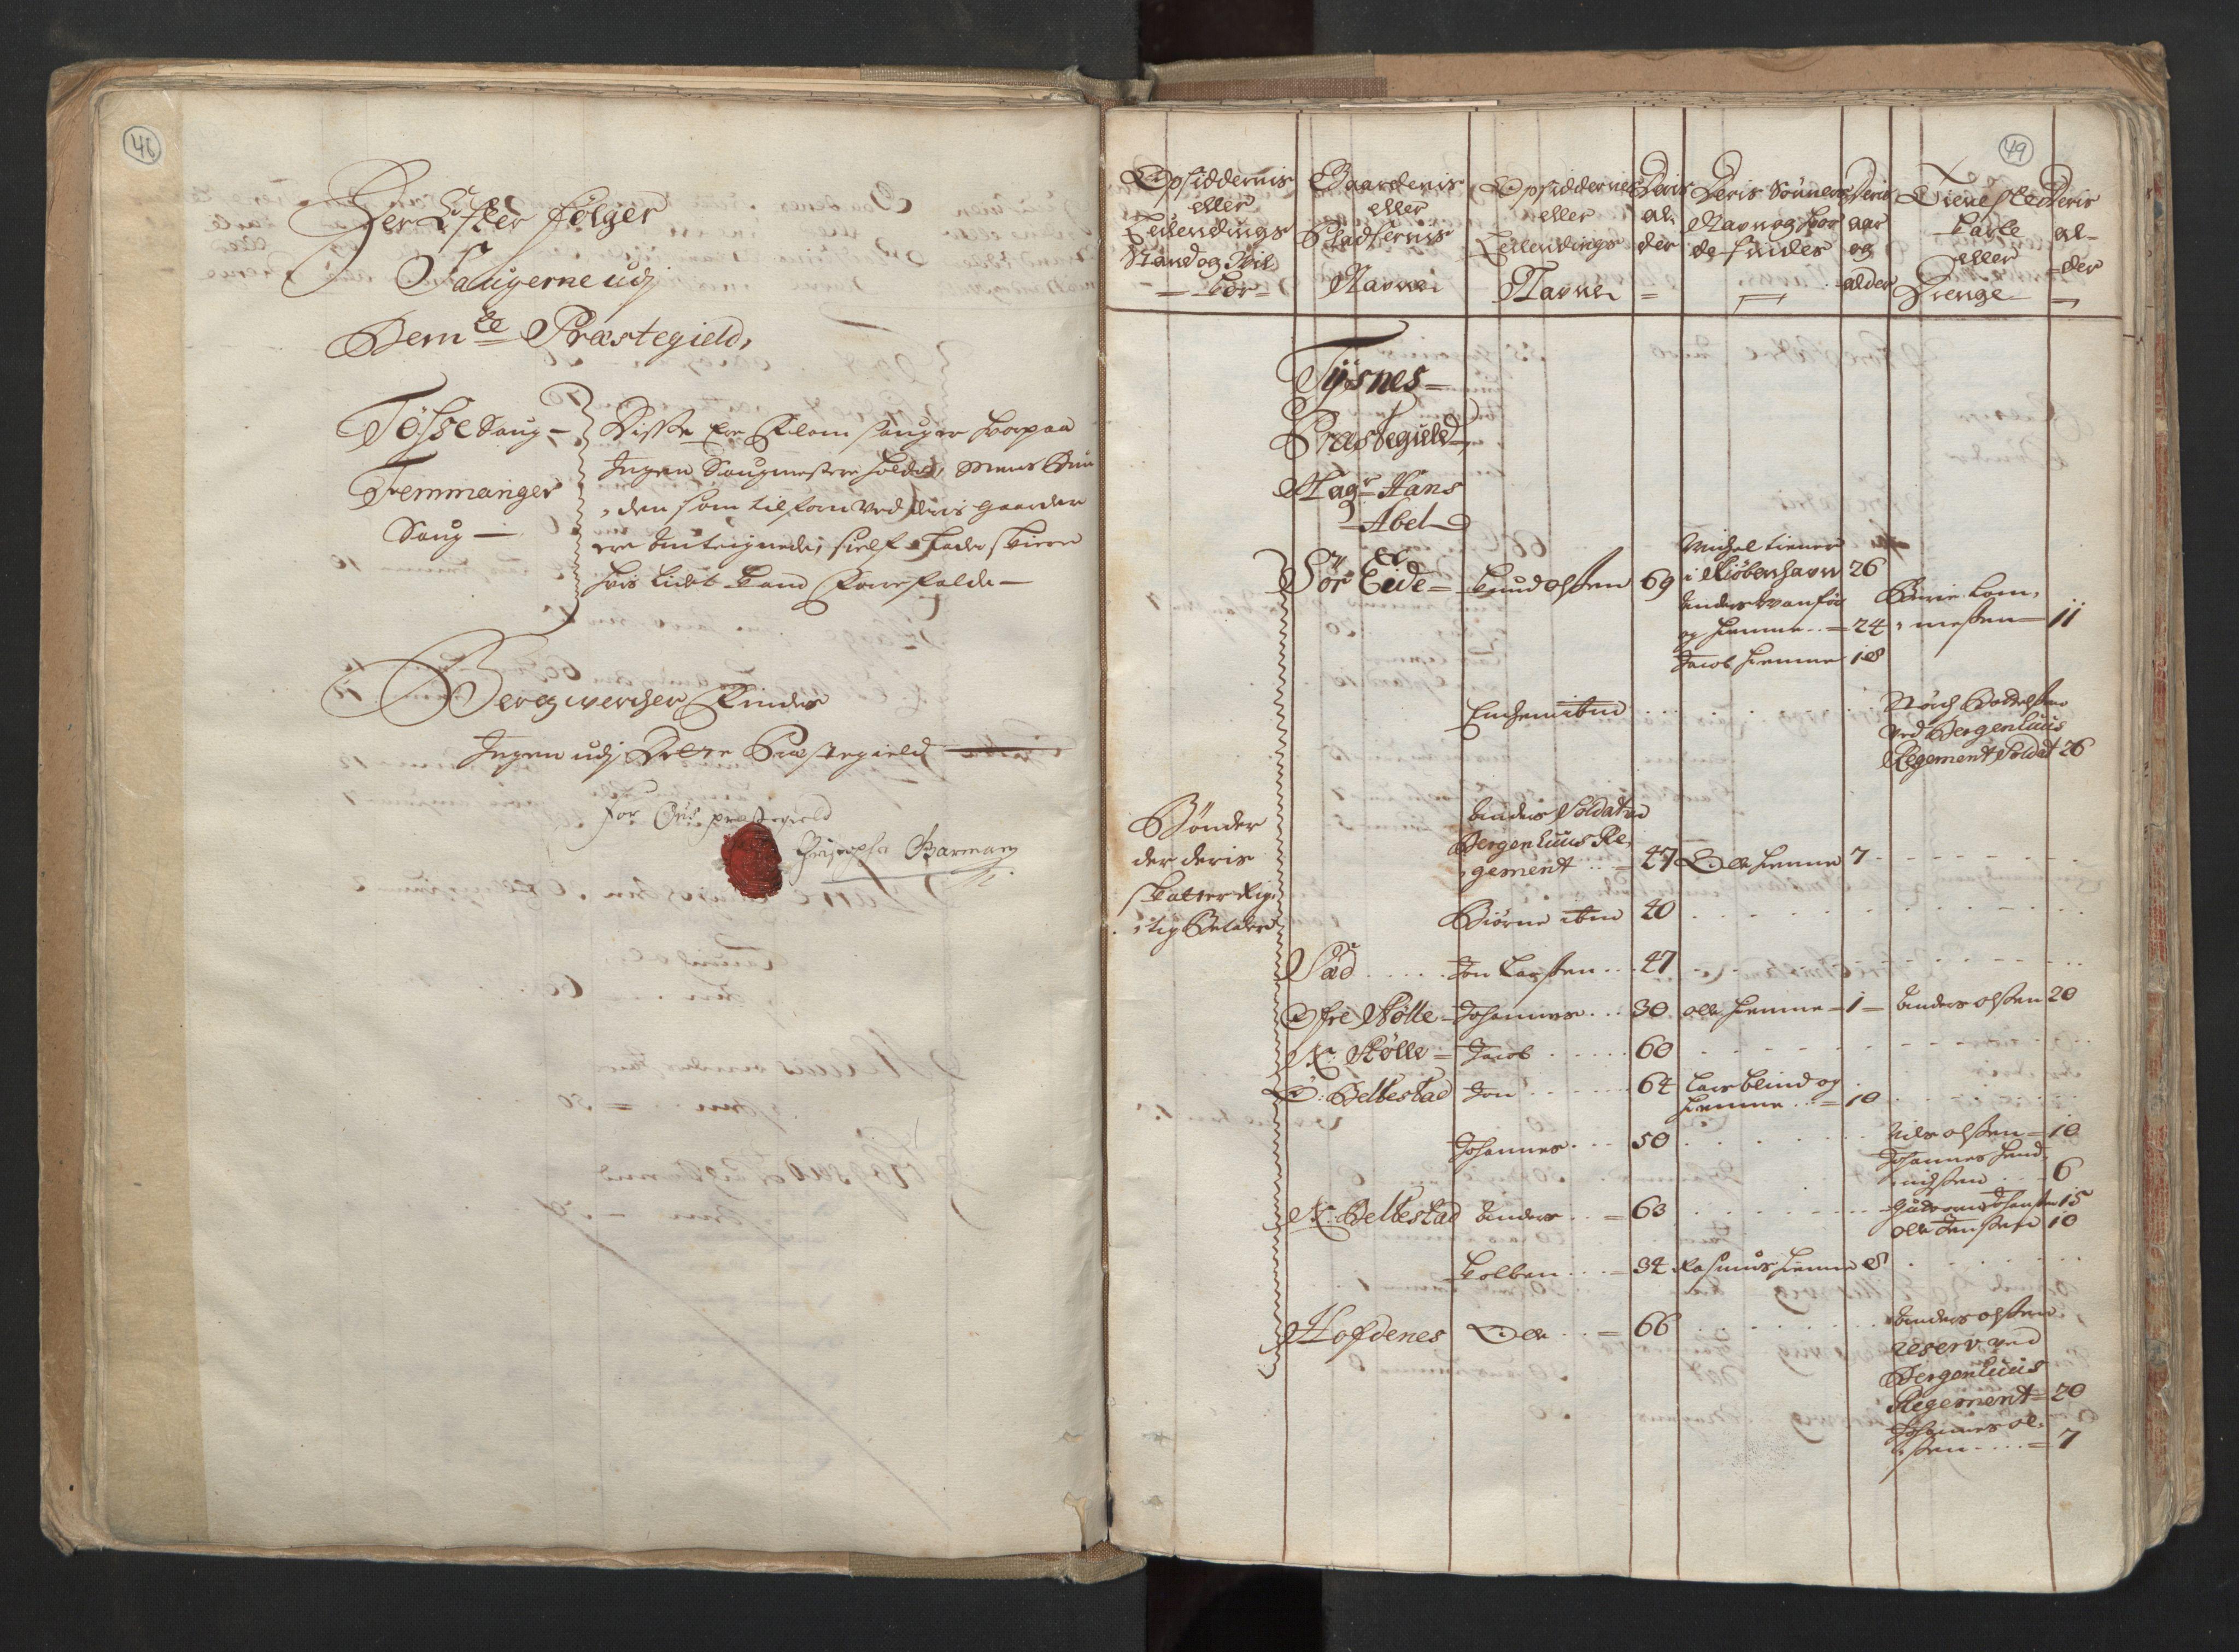 RA, Manntallet 1701, nr. 6: Sunnhordland fogderi og Hardanger fogderi, 1701, s. 48-49